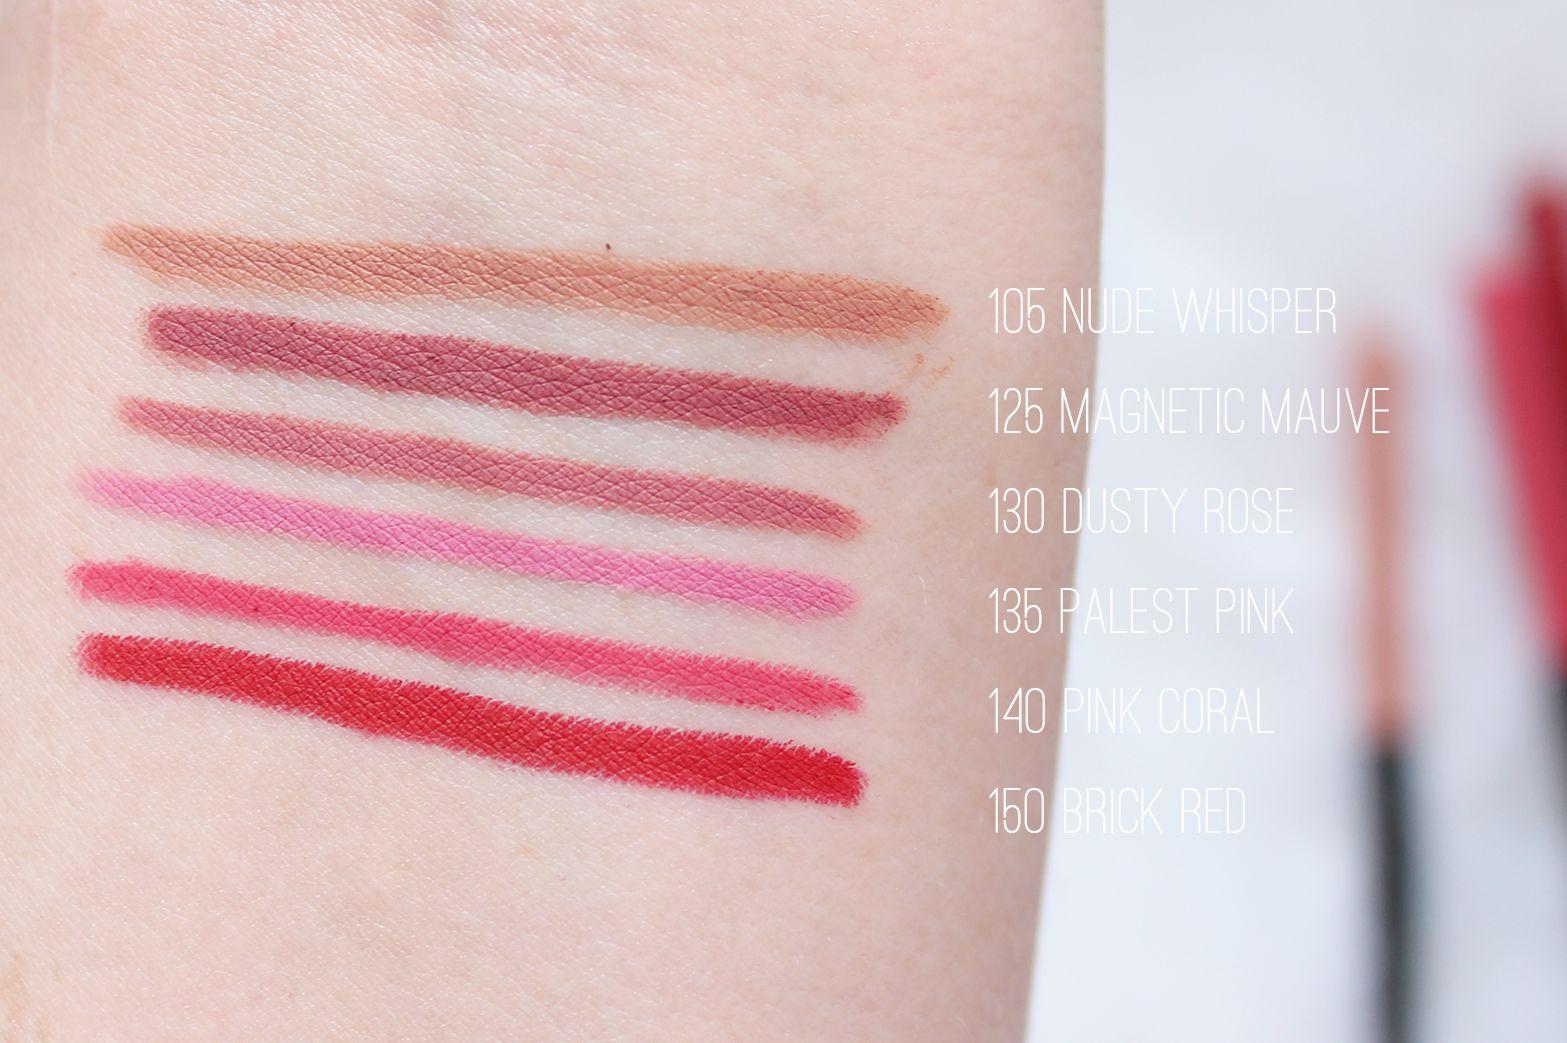 Lip Studio Color Contour Lip Palette by Maybelline #20